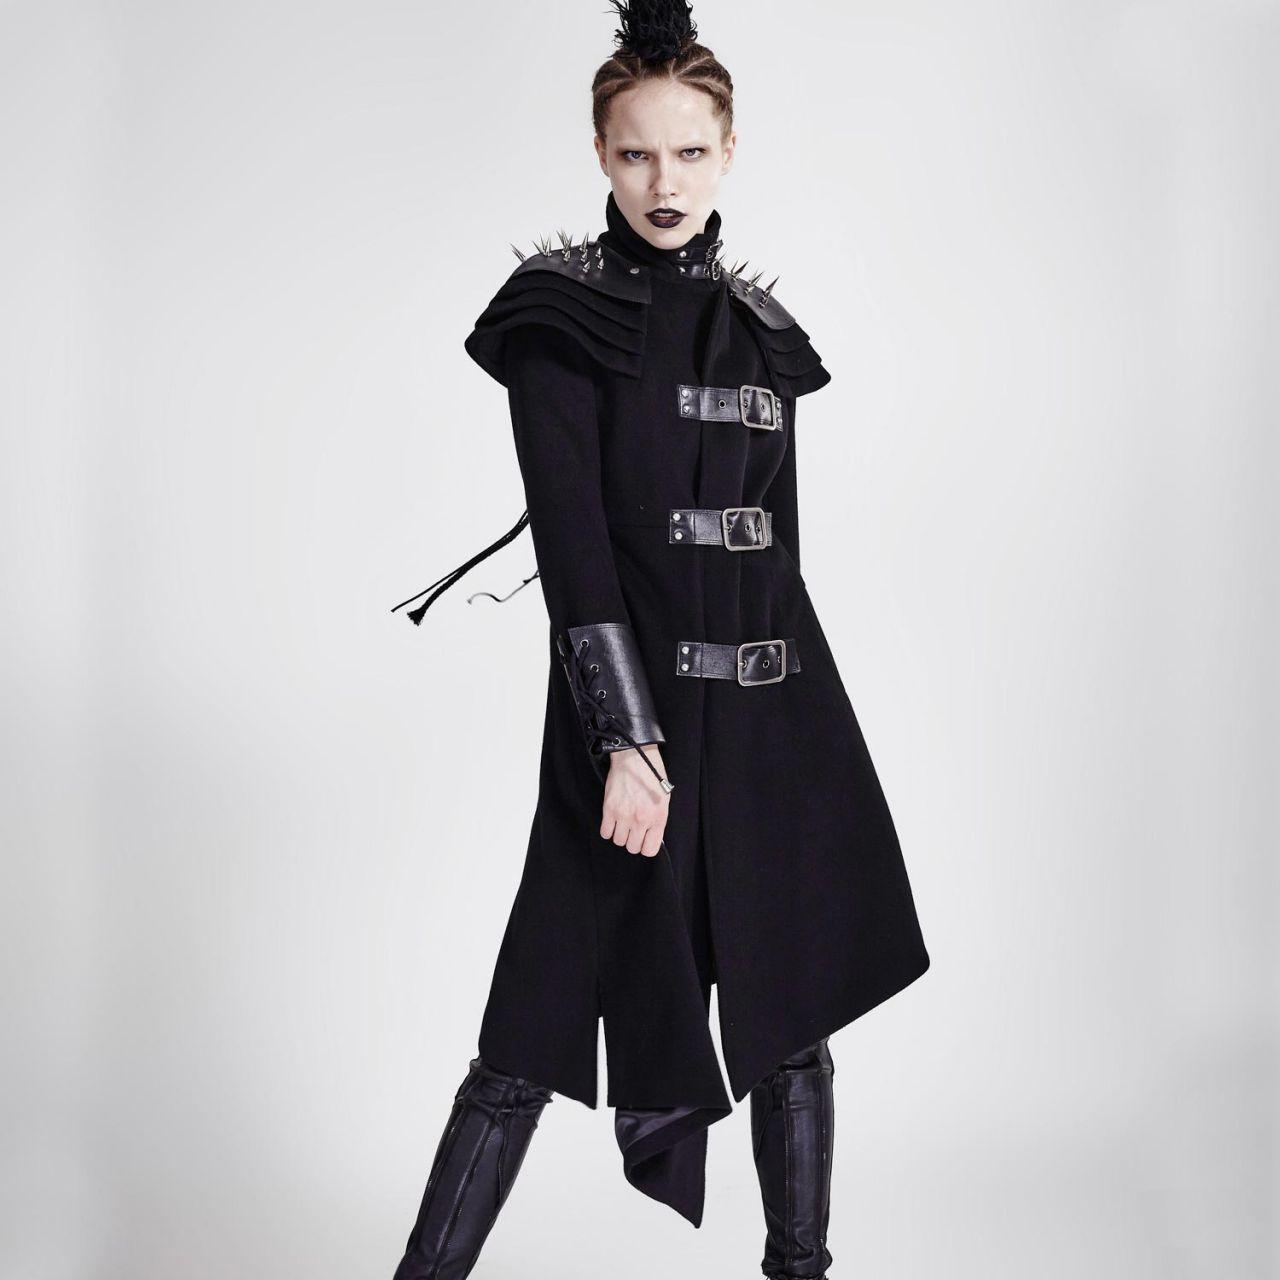 Damen Mantel Damen Asymmetrisch Stehkragen Mantel Offiziersmantel Asymmetrisch Stehkragen Mantel Asymmetrisch Offiziersmantel Damen EIW2DH9